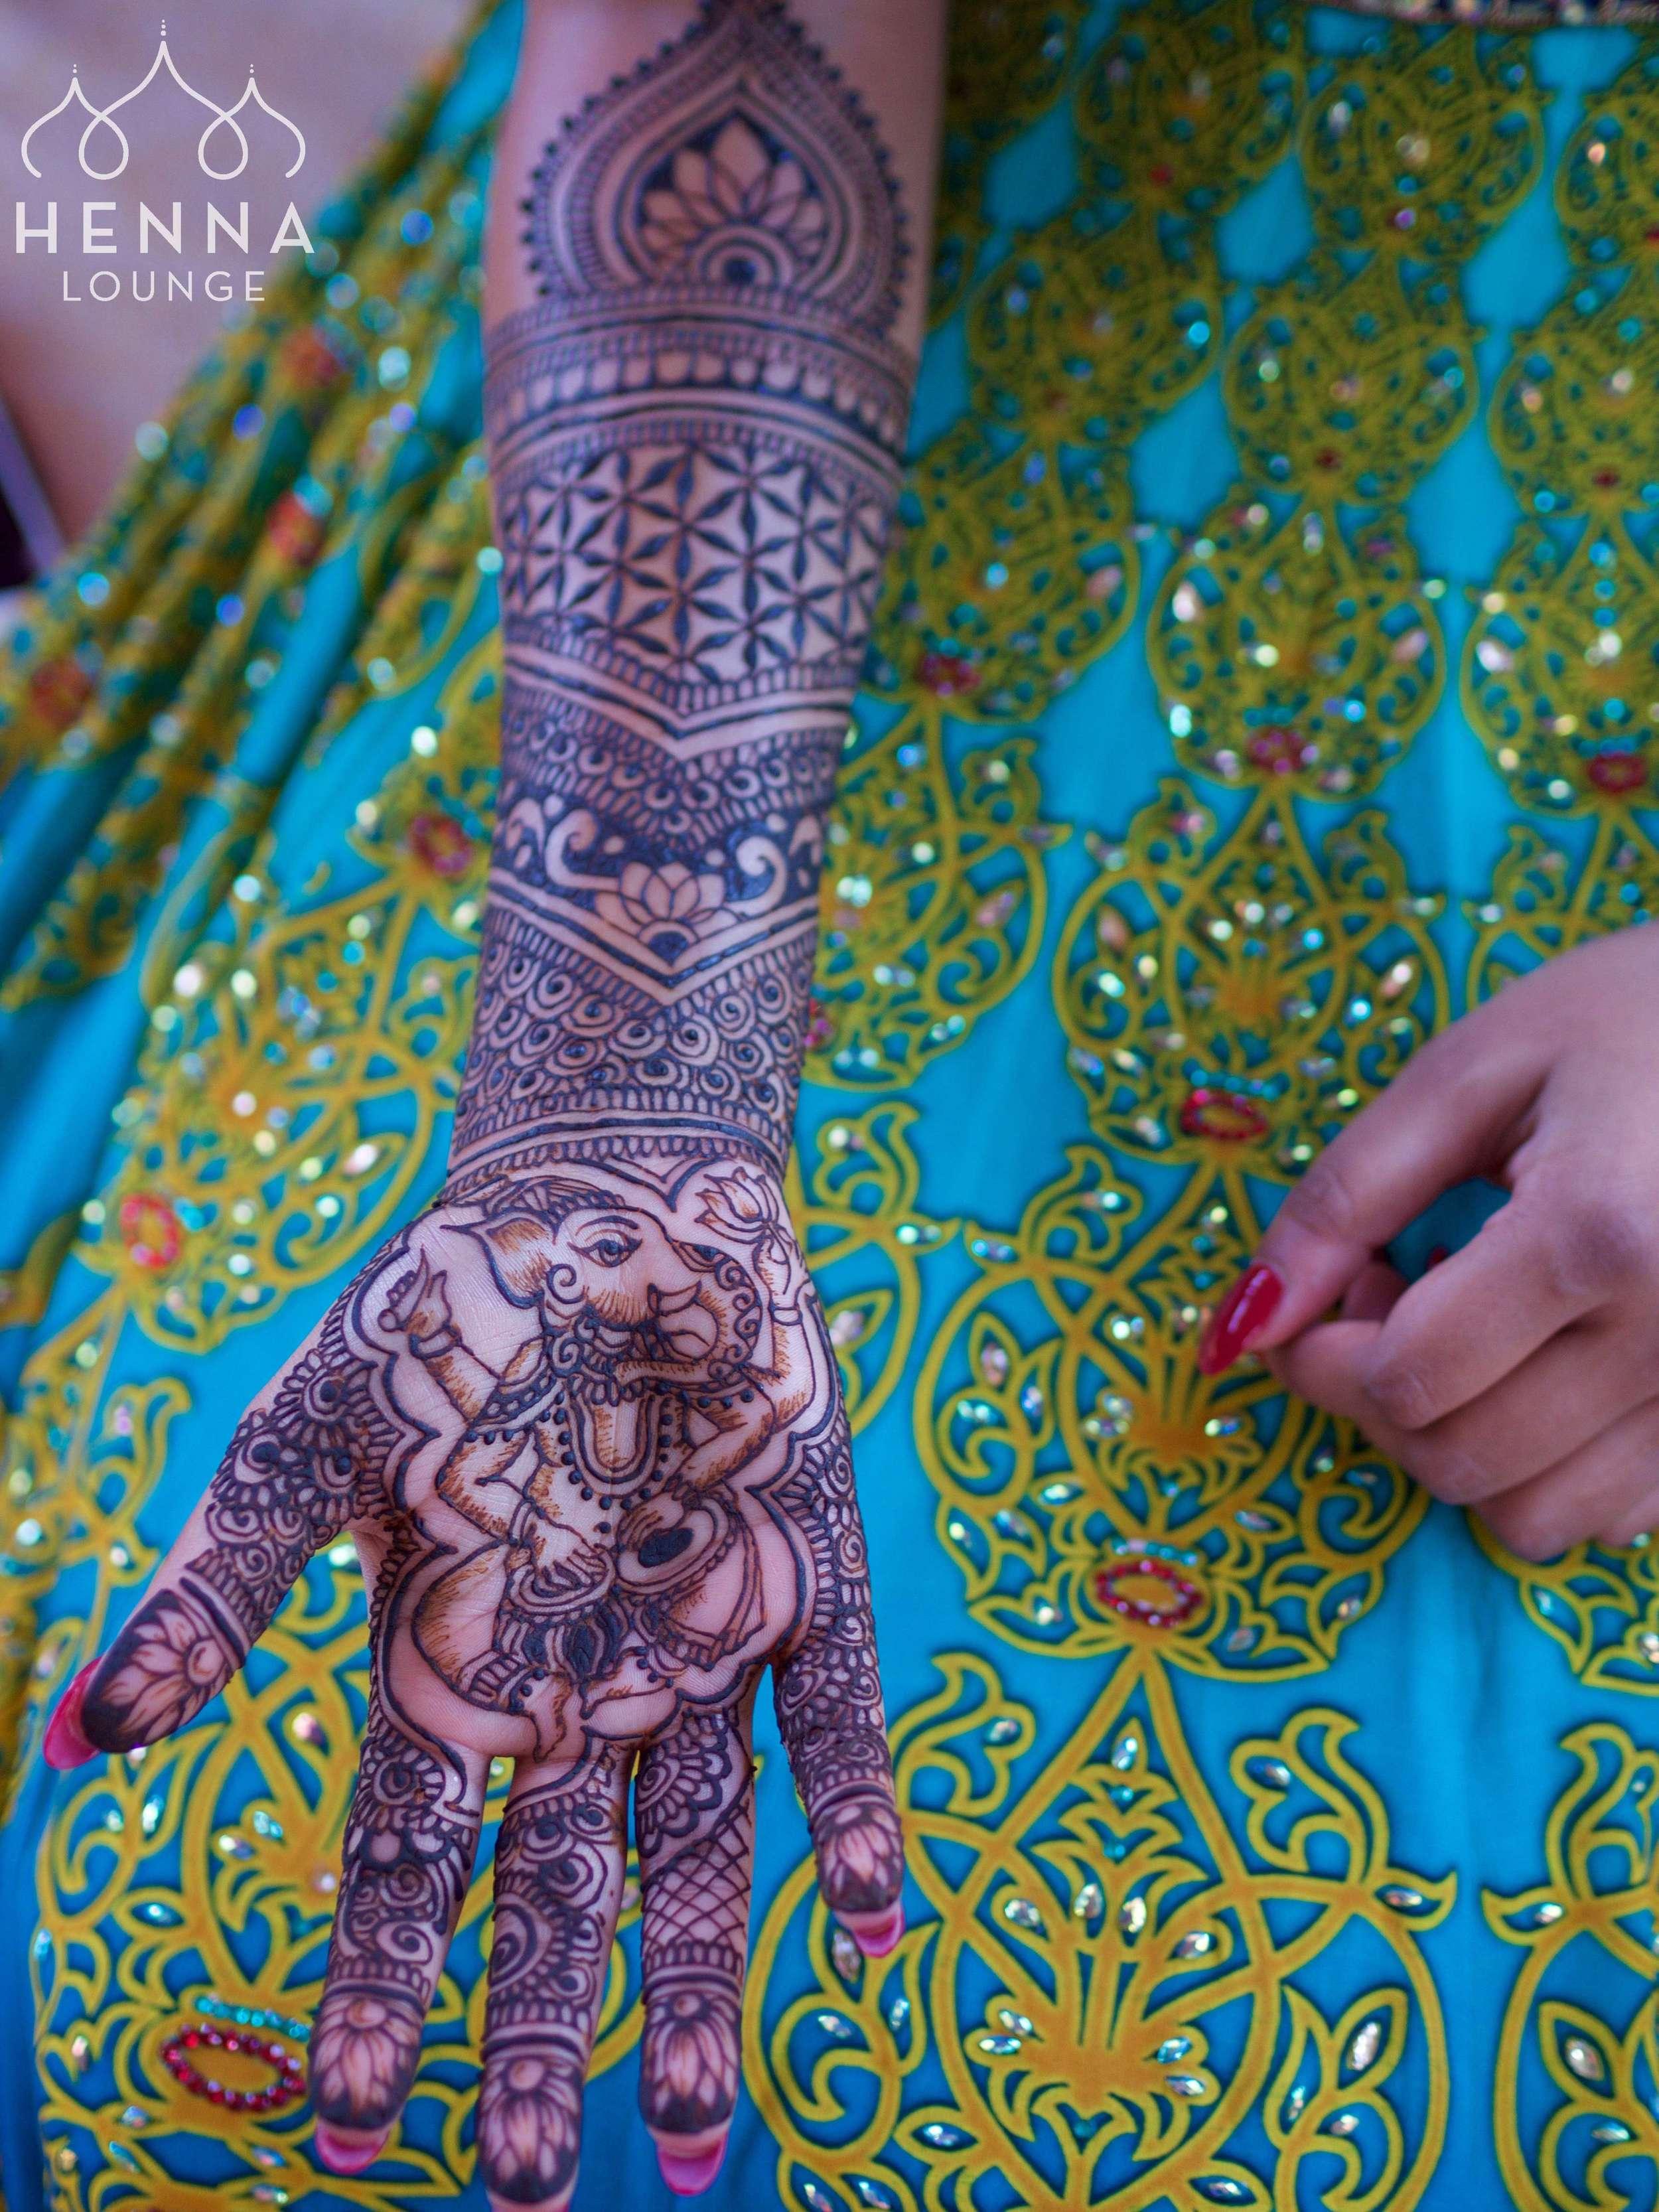 Ganesha with tabla by www.hennalounge.com